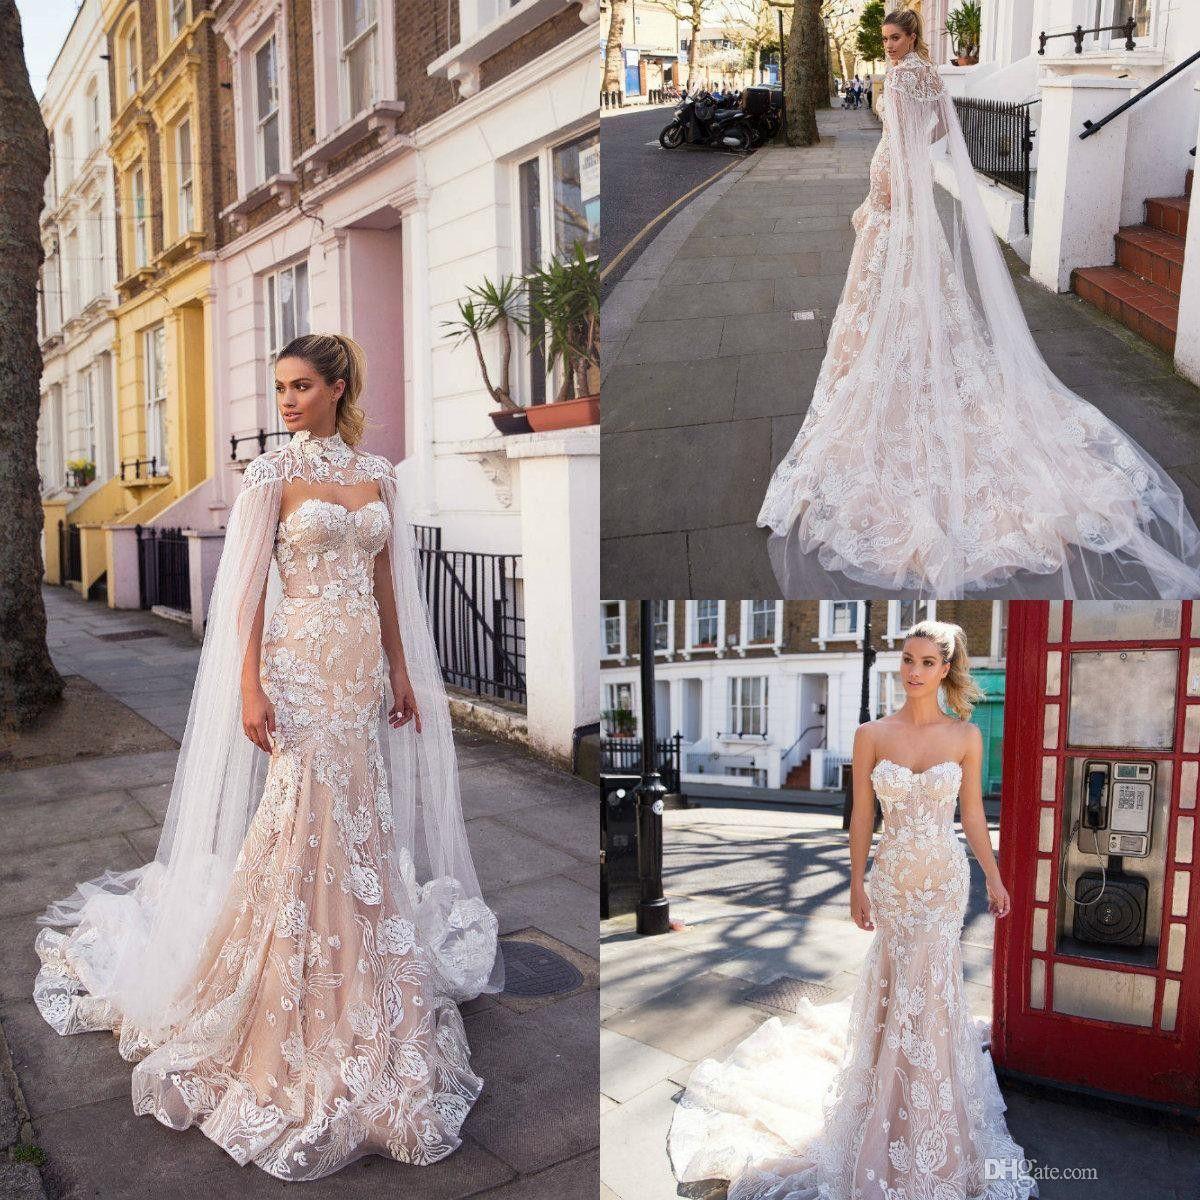 Milla Nova 2019 Champagne Wedding Dresses With Wrap